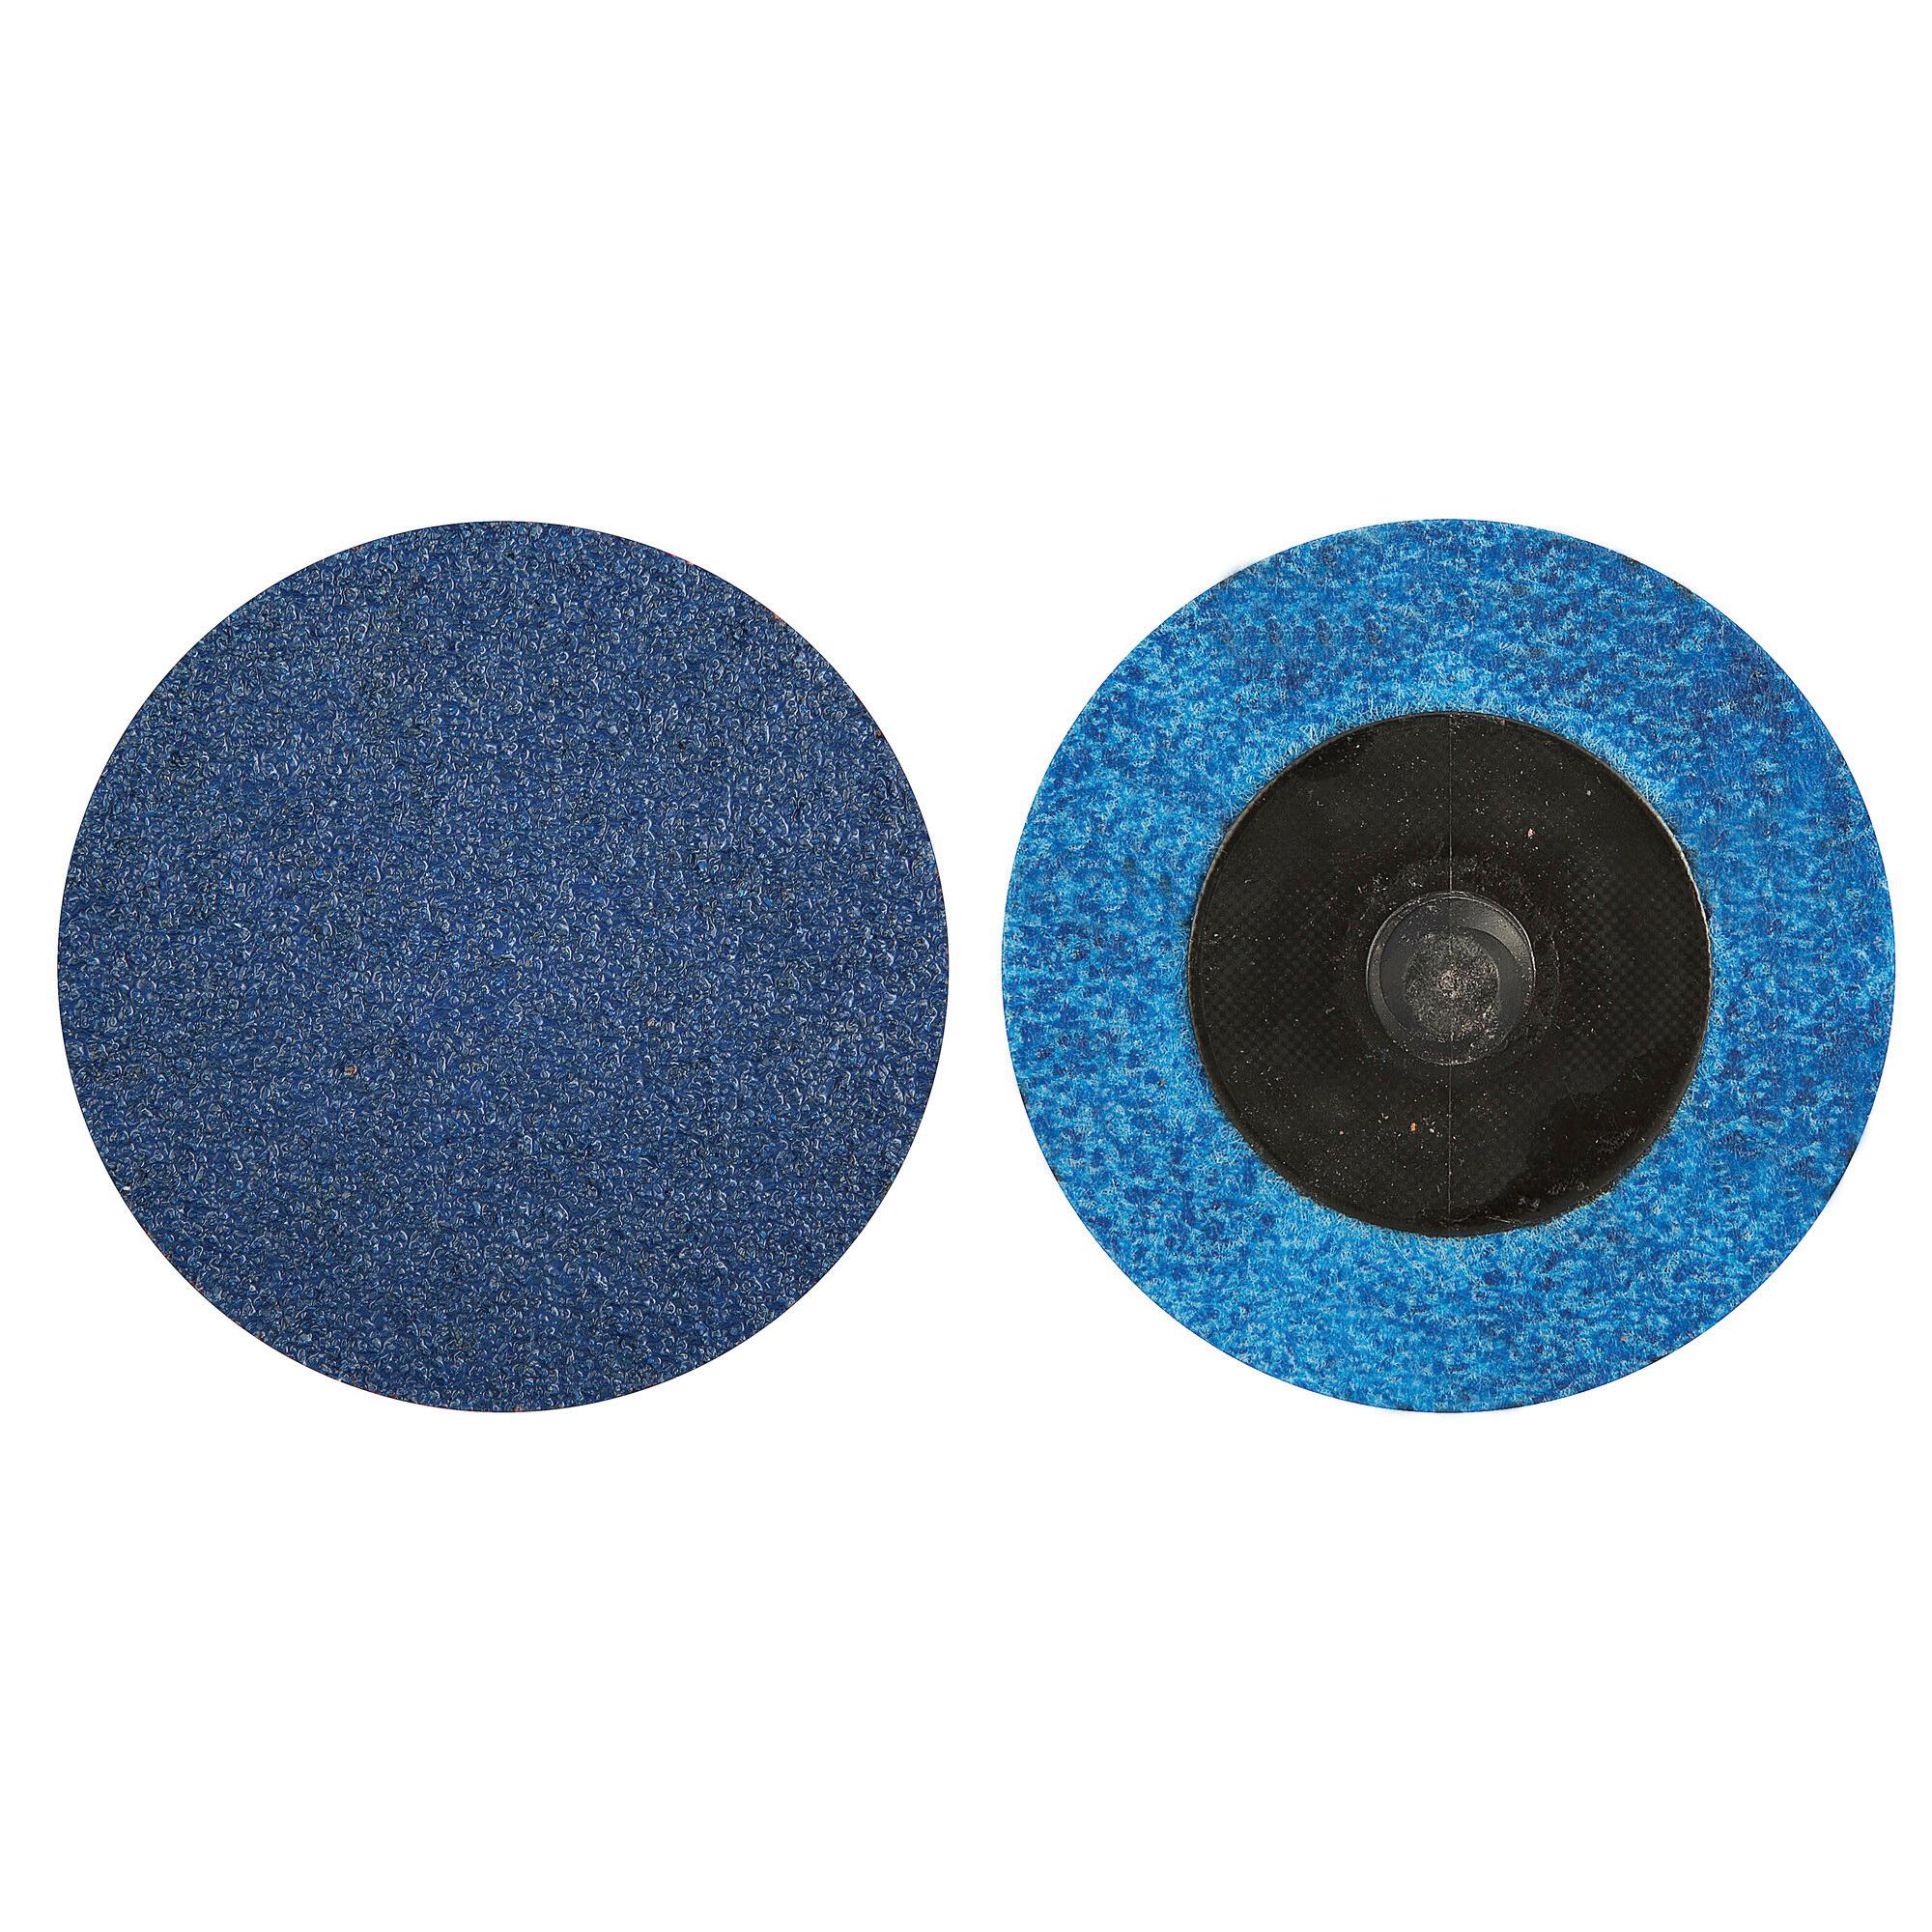 Norton® BlueFire® 66261138672 R884P Coated Abrasive Quick-Change Disc, 2 in Dia, 24 Grit, Extra Coarse Grade, Zirconia Alumina Abrasive, Type TR (Type III) Attachment